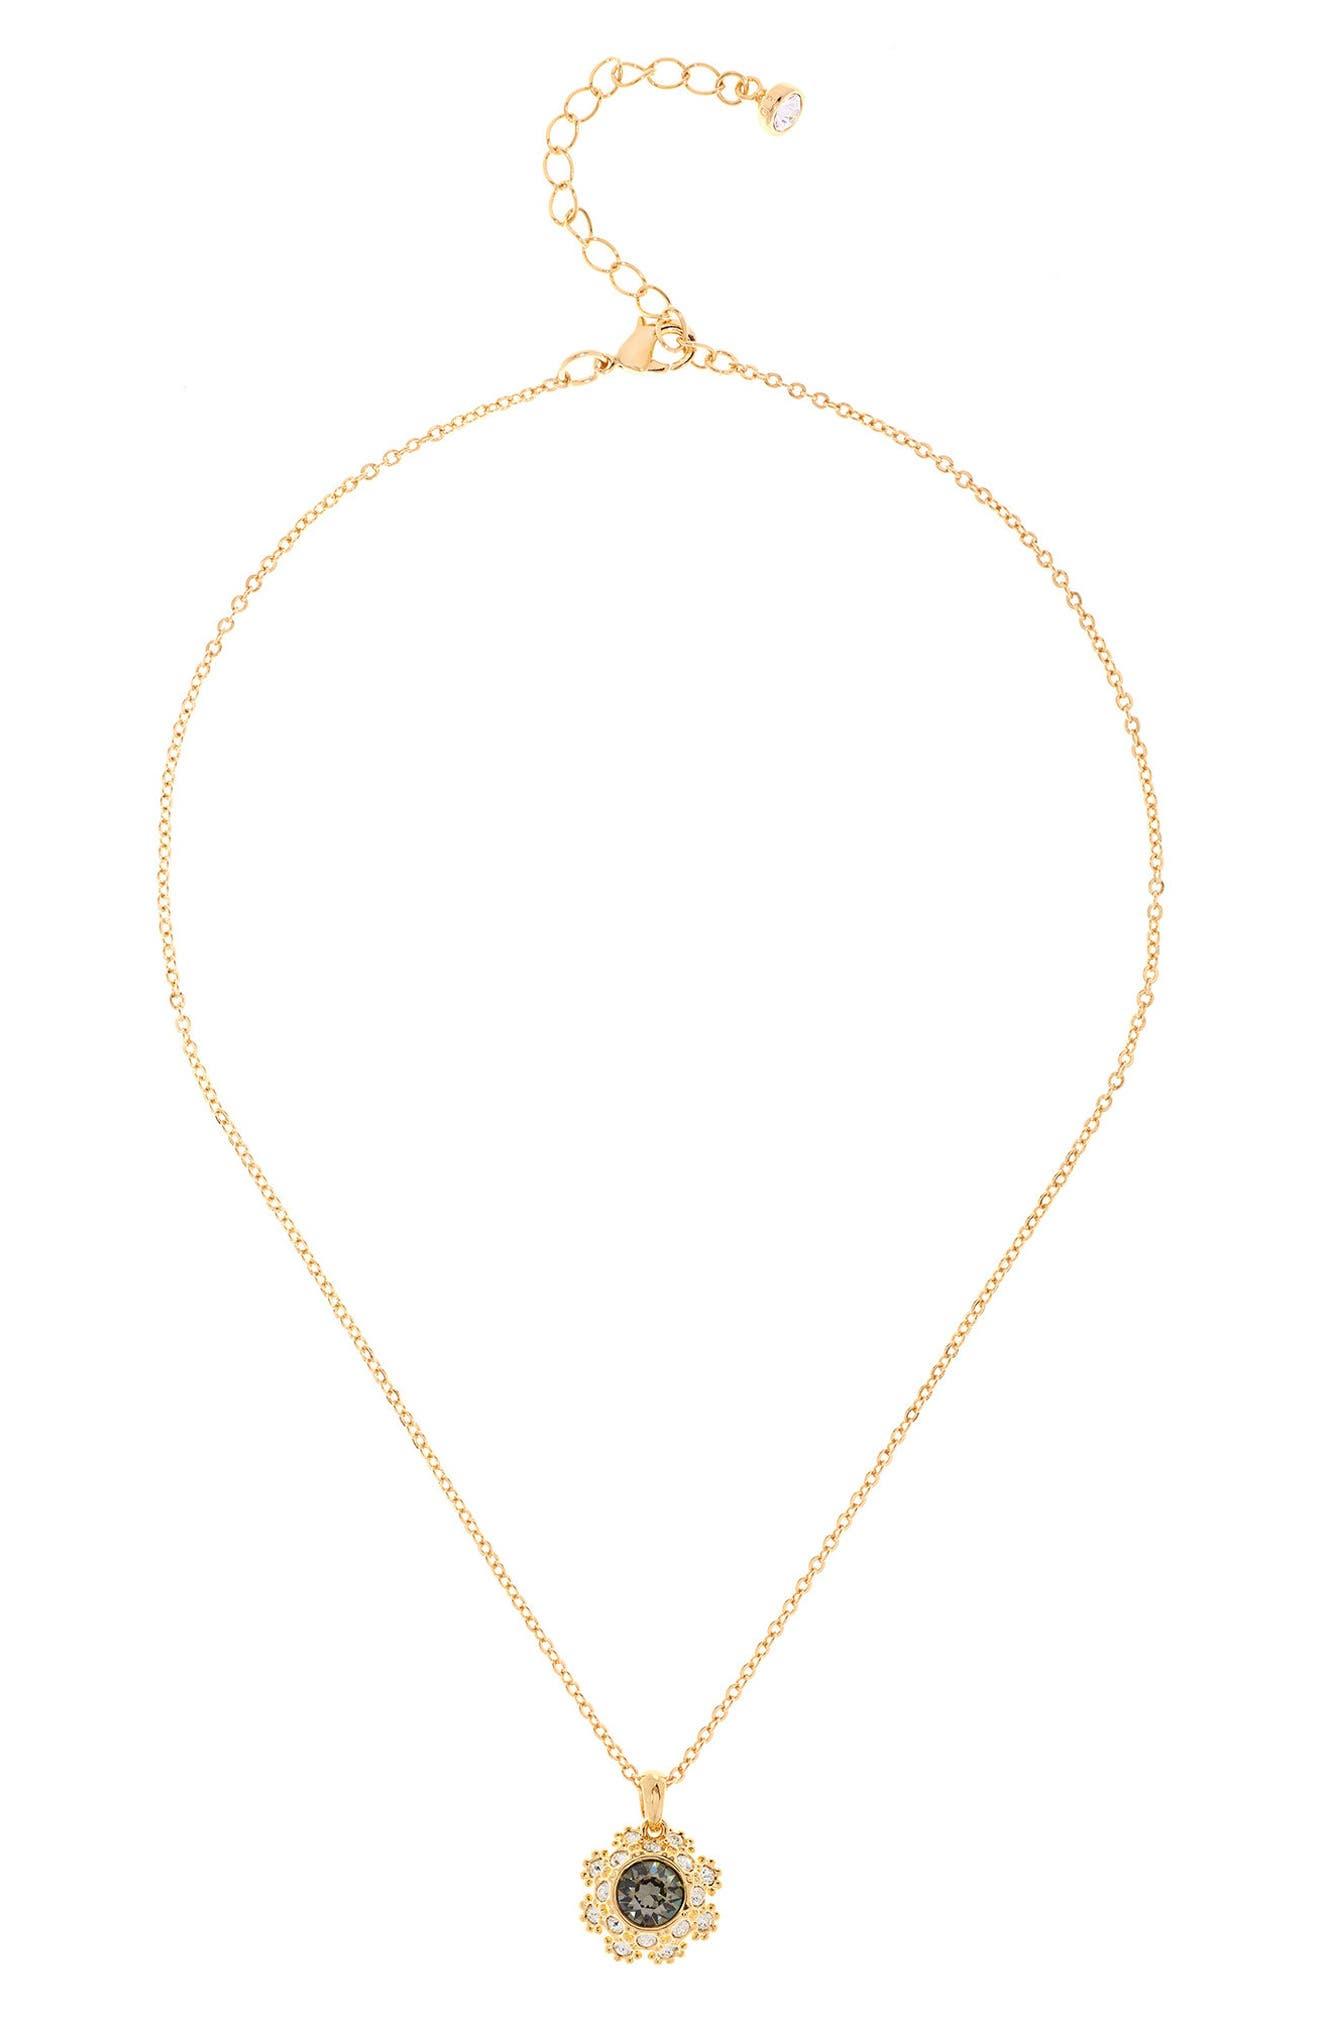 Crystal Daisy Lace Pendant Necklace,                             Main thumbnail 1, color,                             Jet